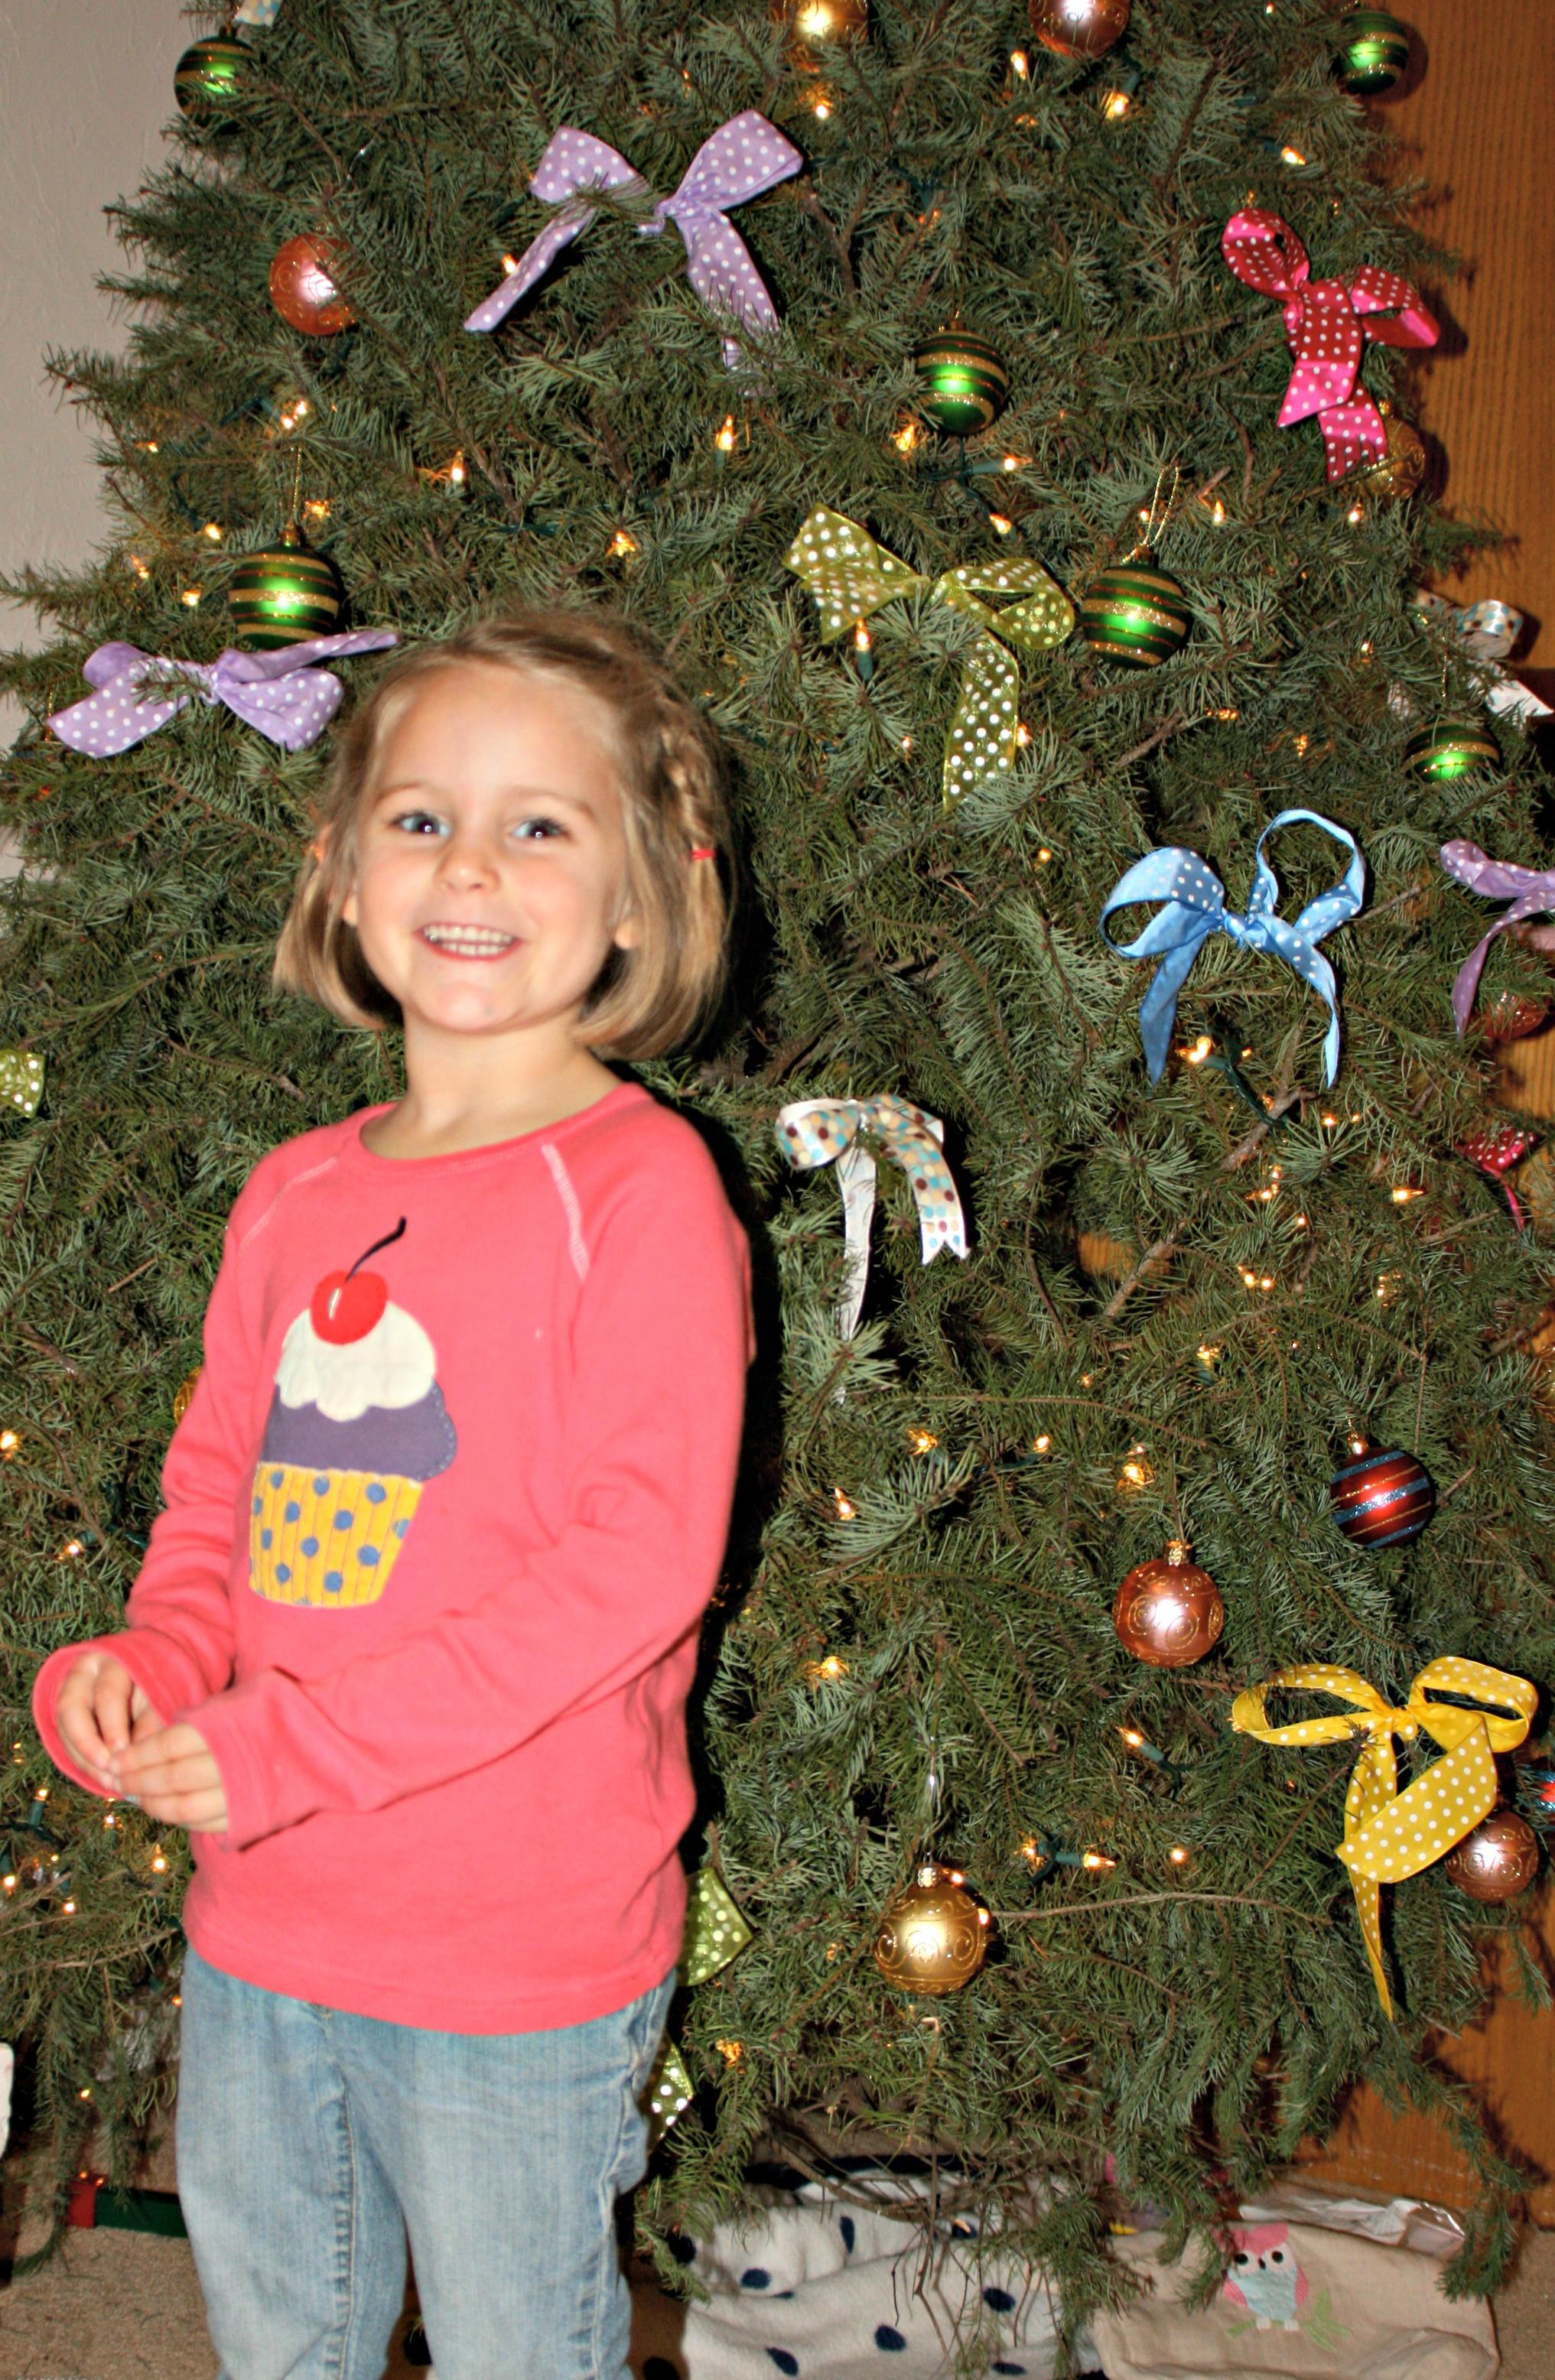 Abby birthday 4 polkadot.jpg